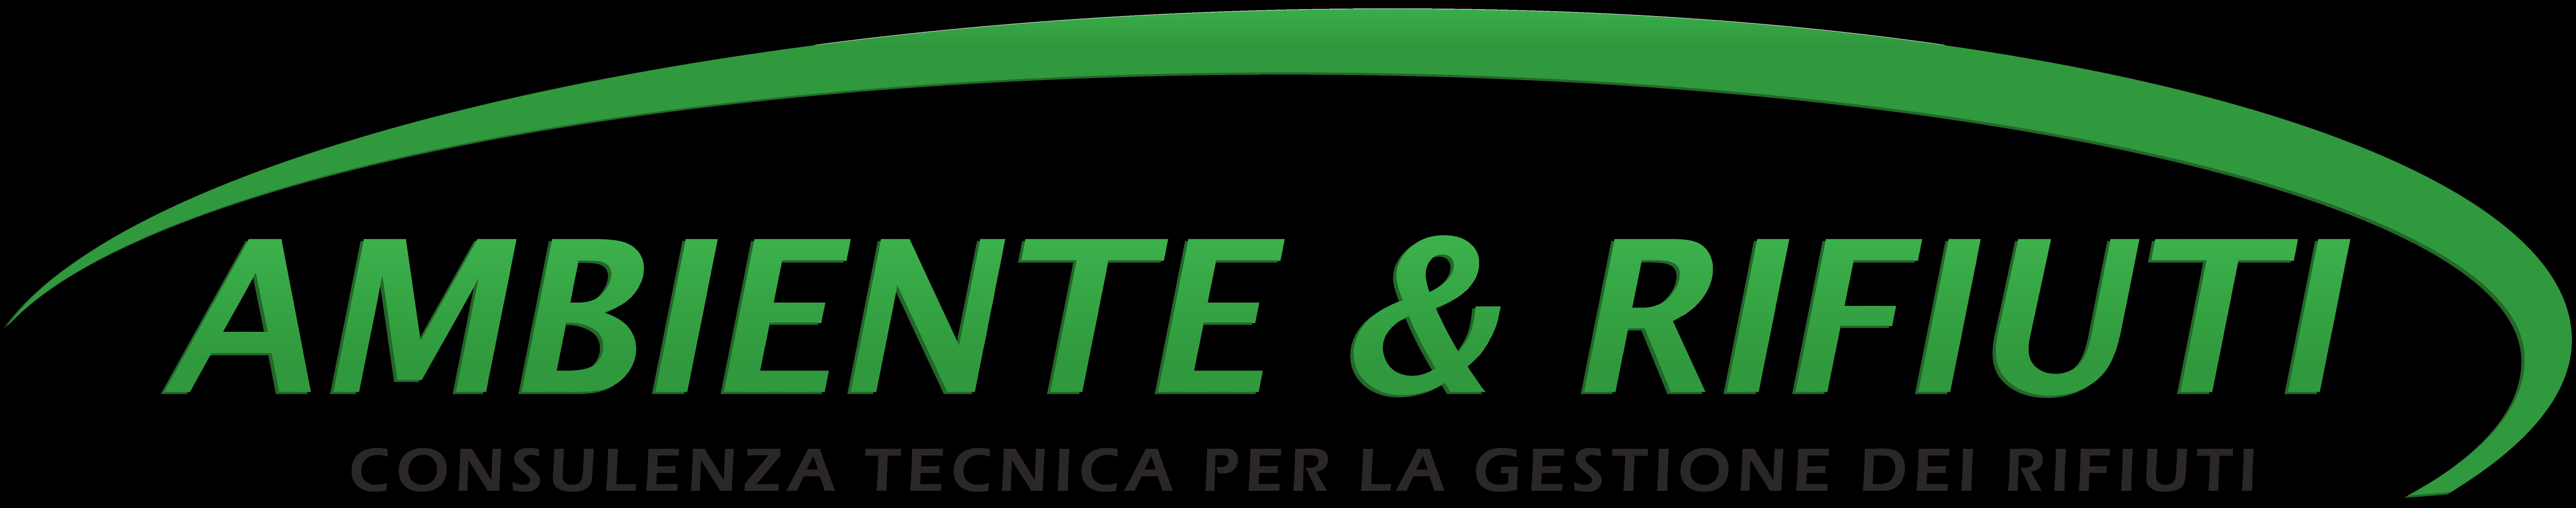 Consulenza Ambiente & Rifiuti logo